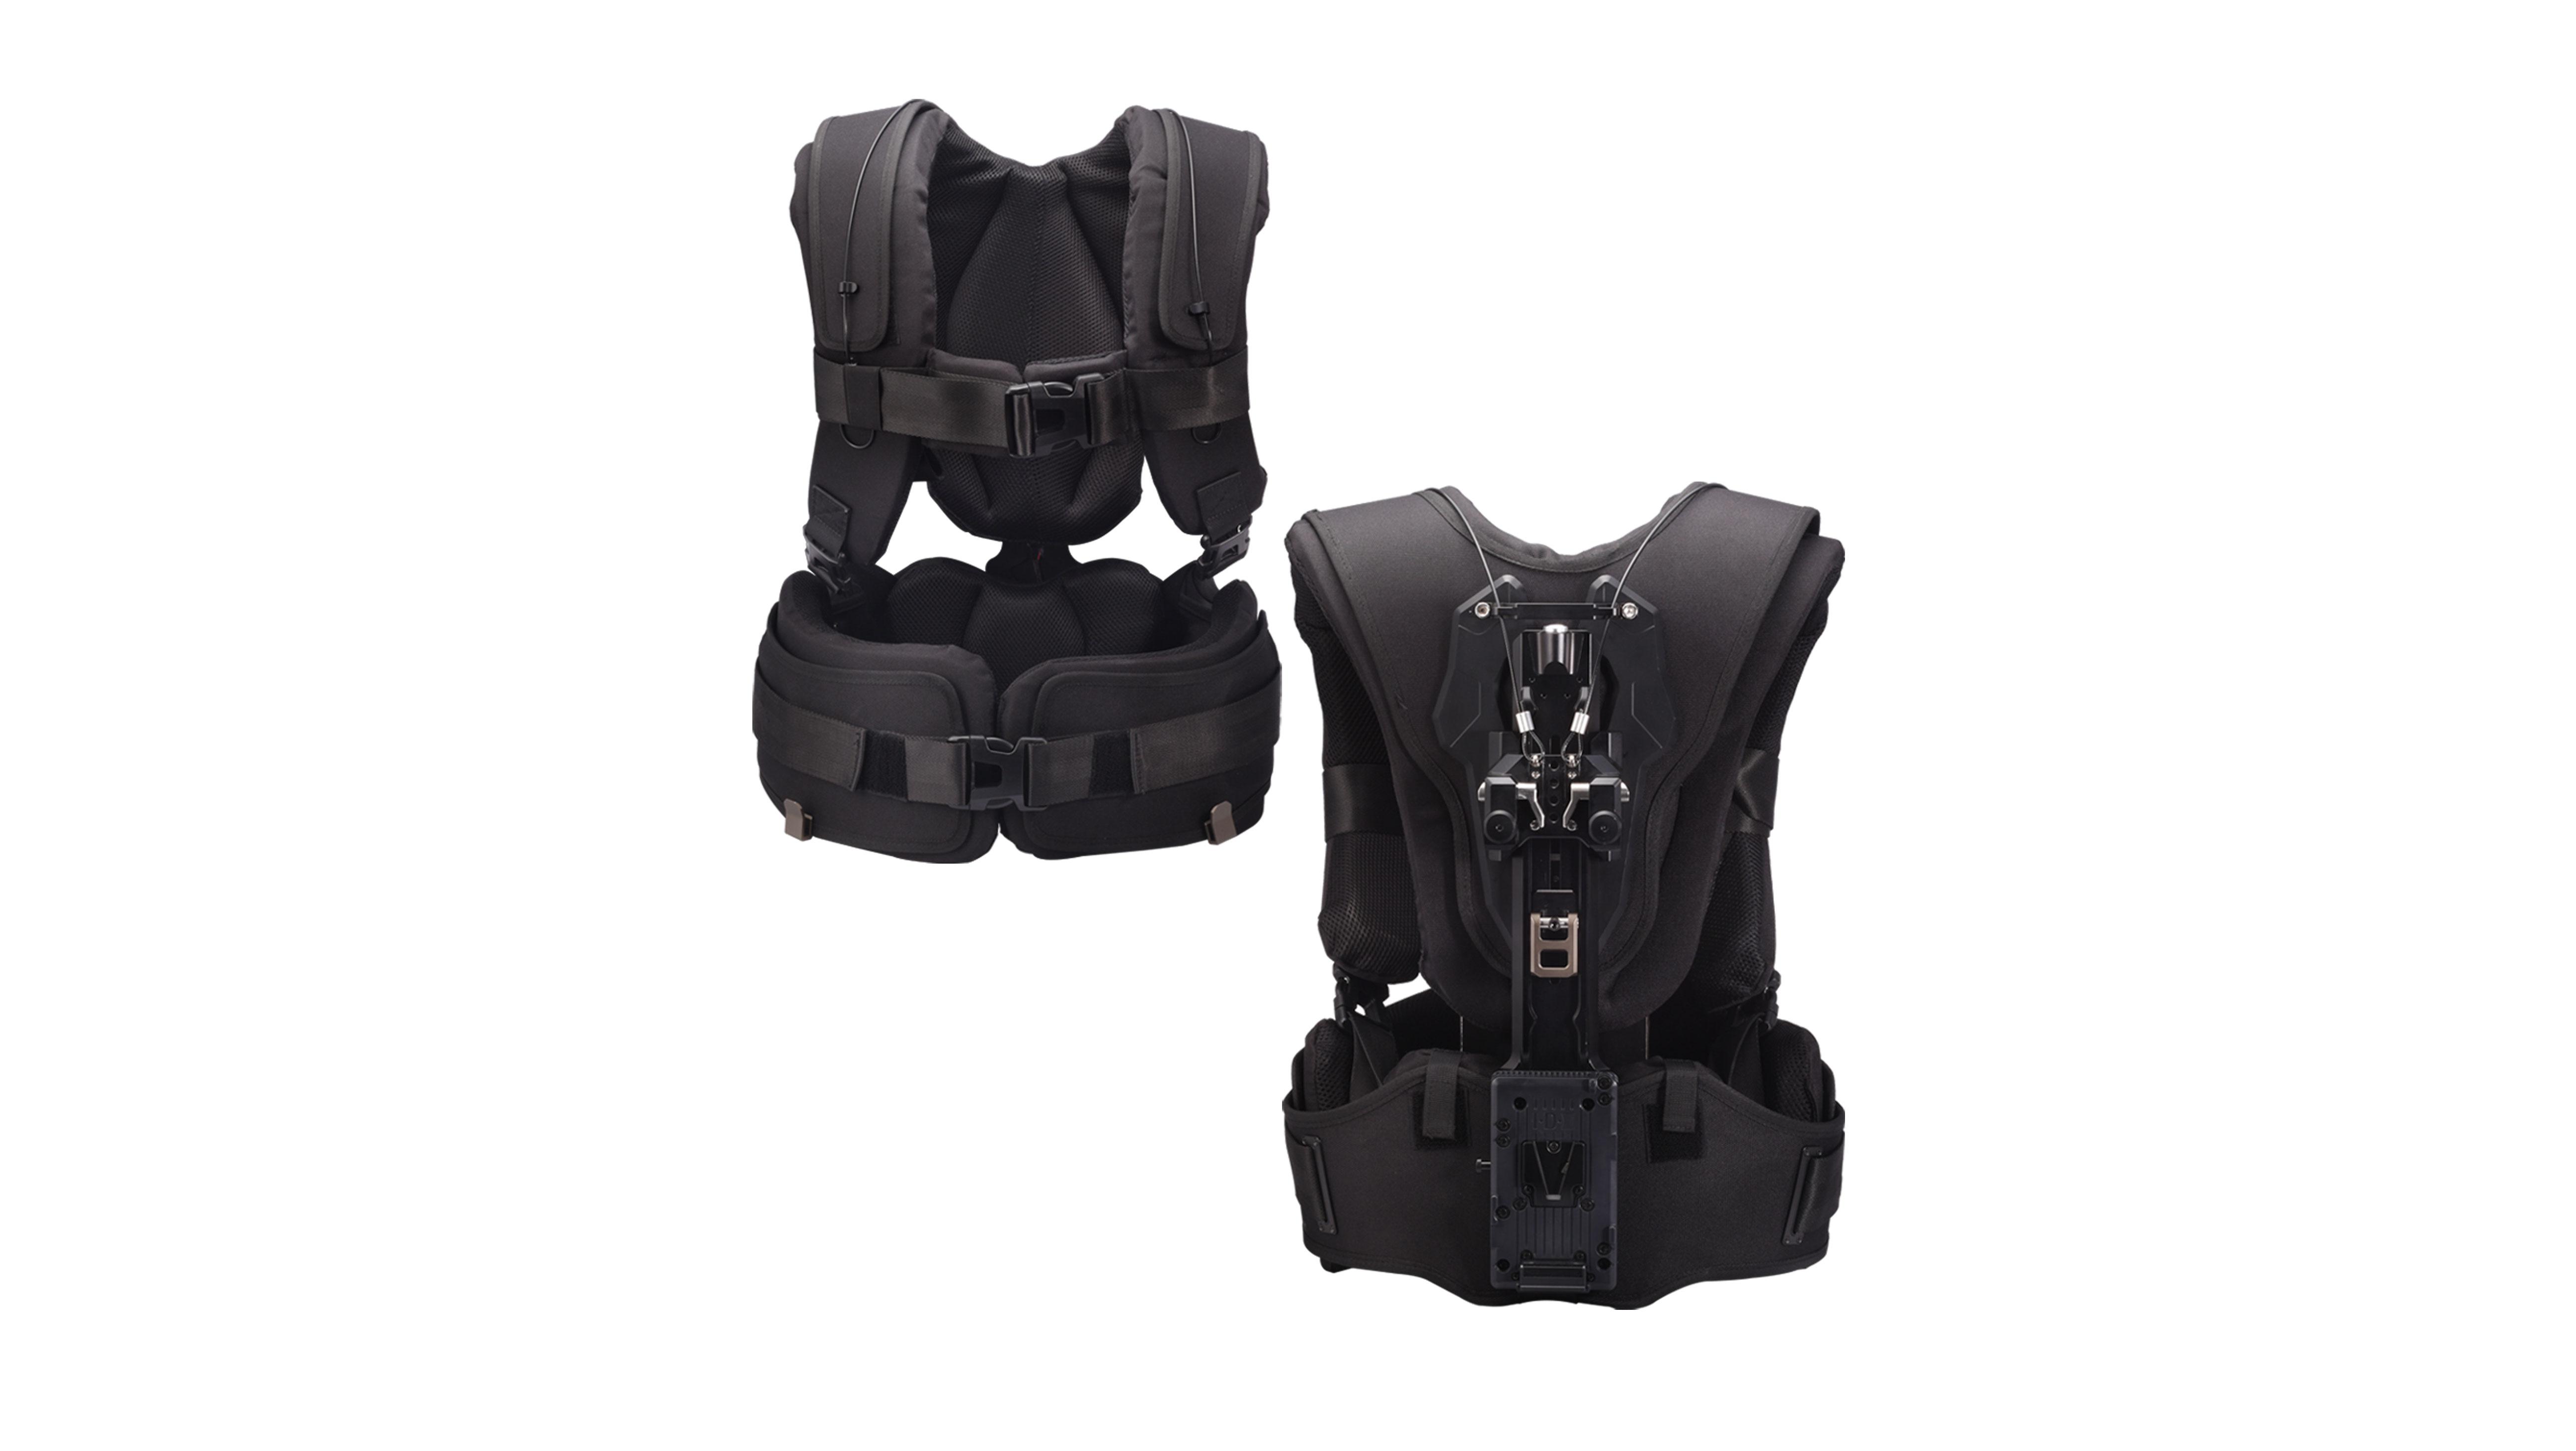 Armor Man 2.0 - Vest Only